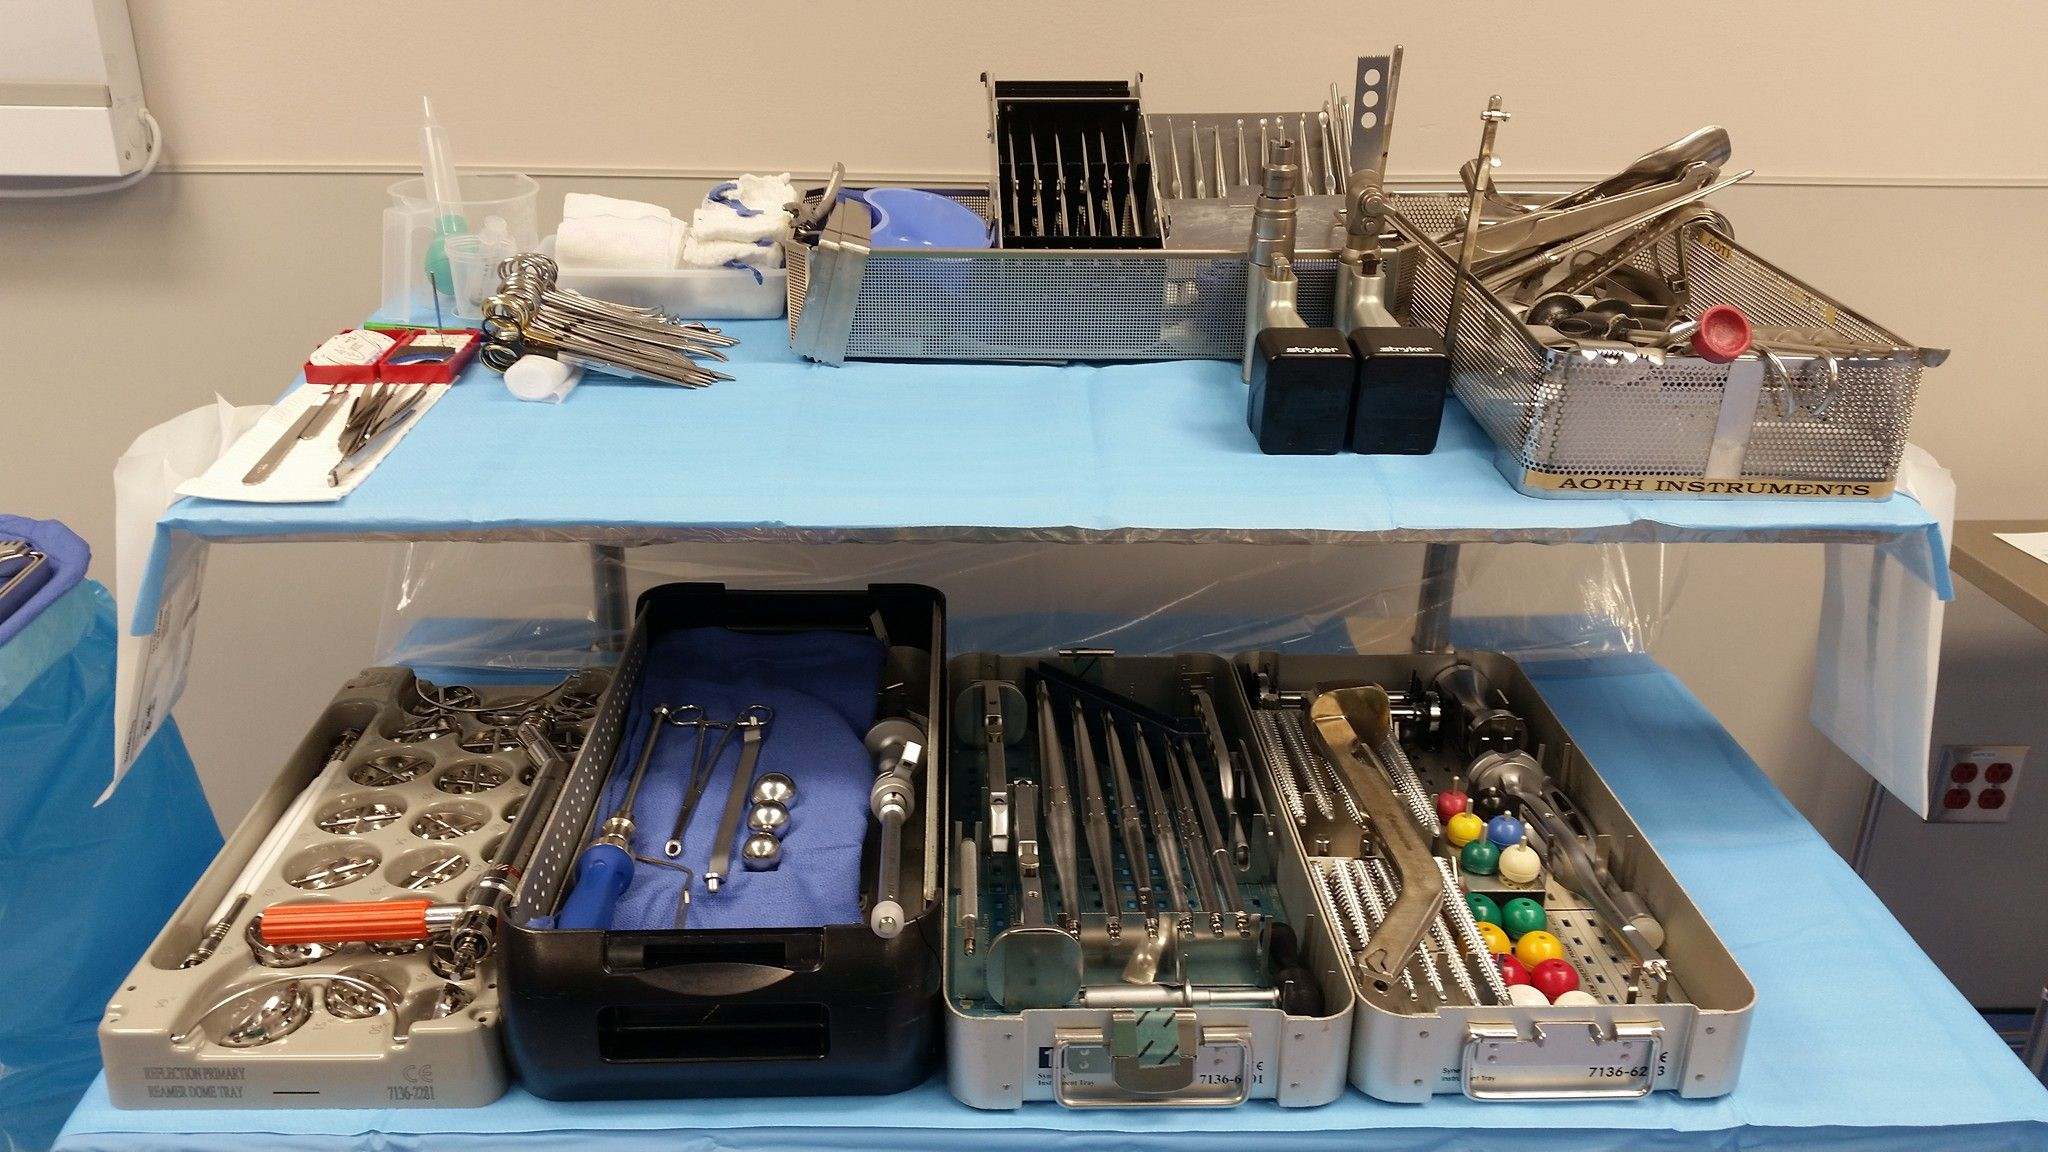 Photos & description of instrumentation used for Total Hip